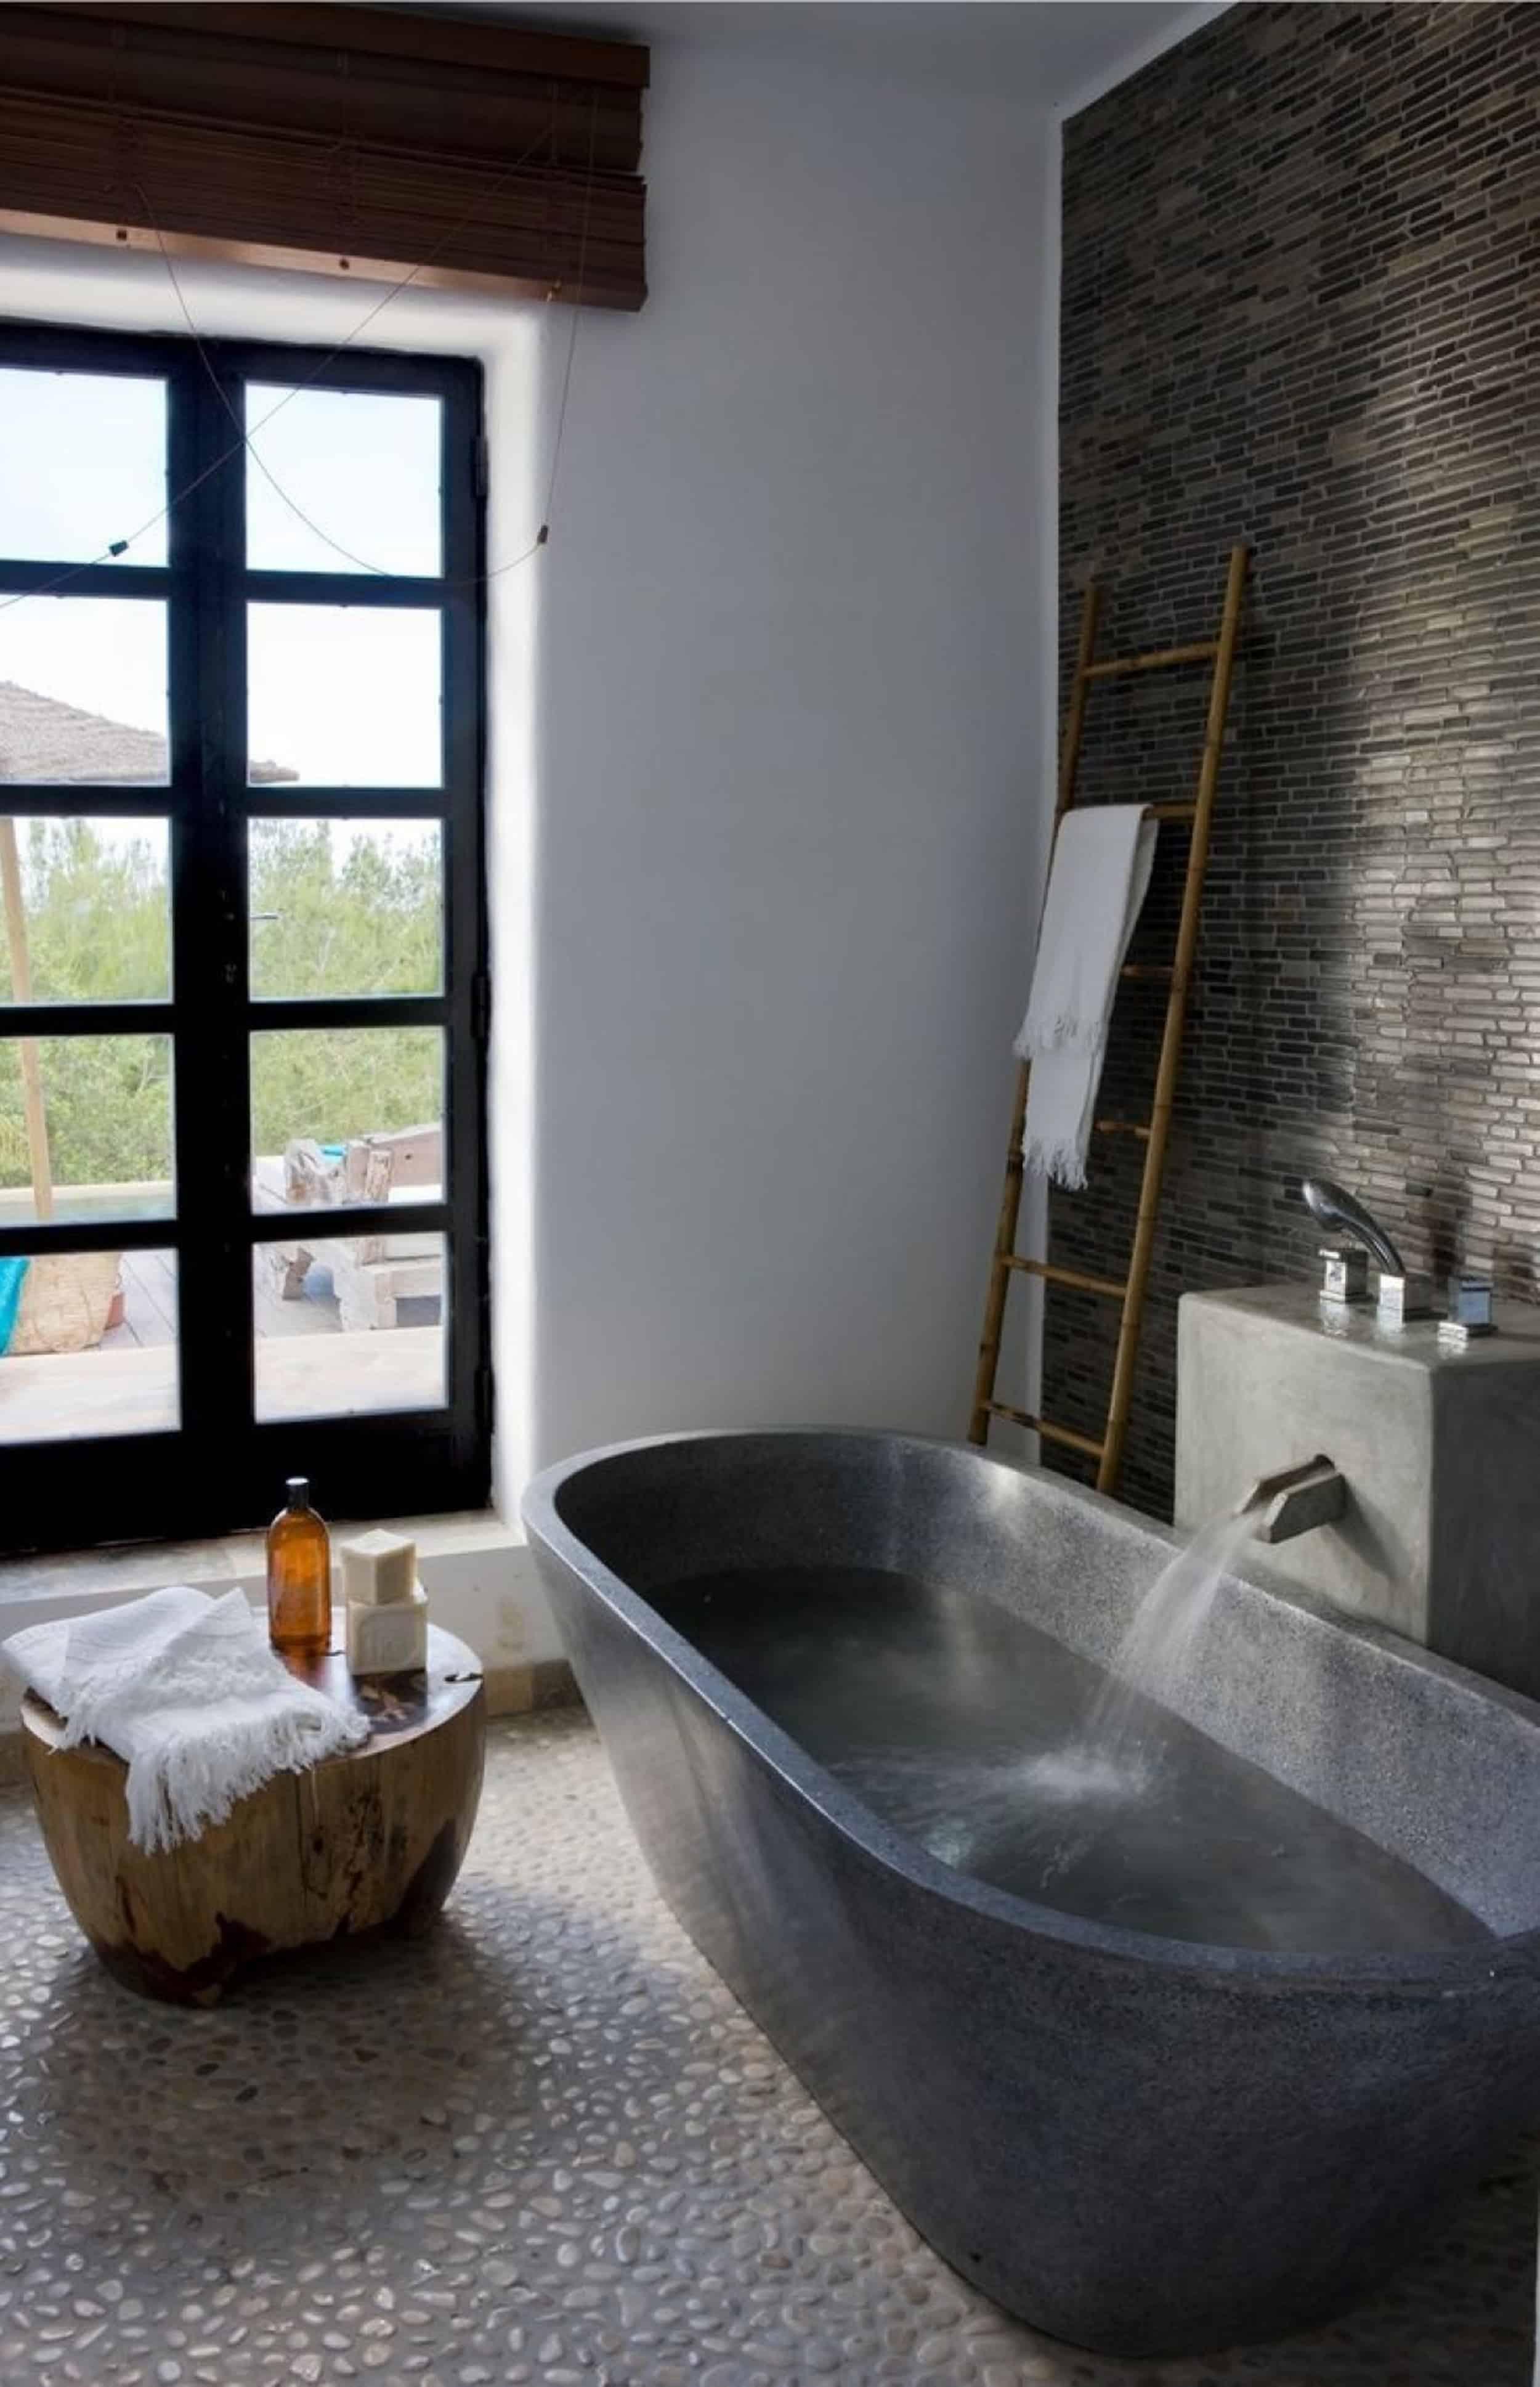 Emily Henderson Mountain Fixer Upper Rethink The Pebble Bathrooms Good Inspo Pics 4